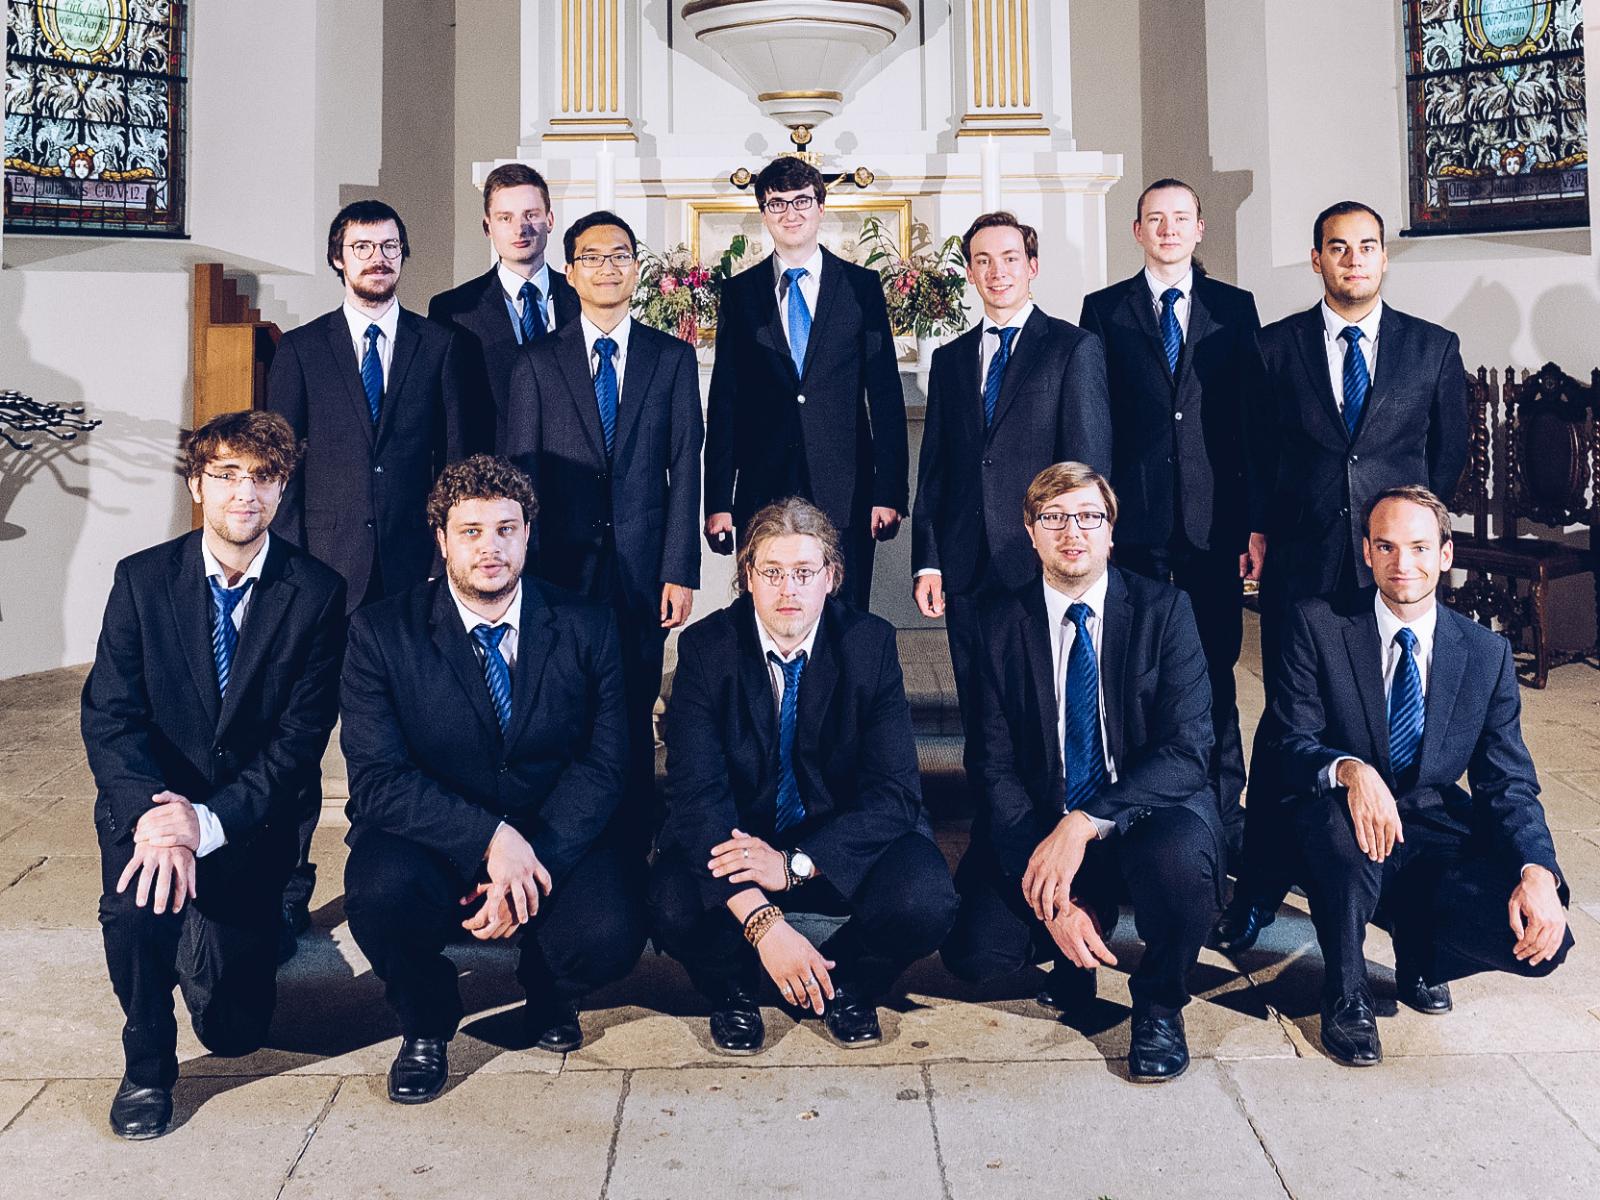 Konzerte in St. Josef im September 2019